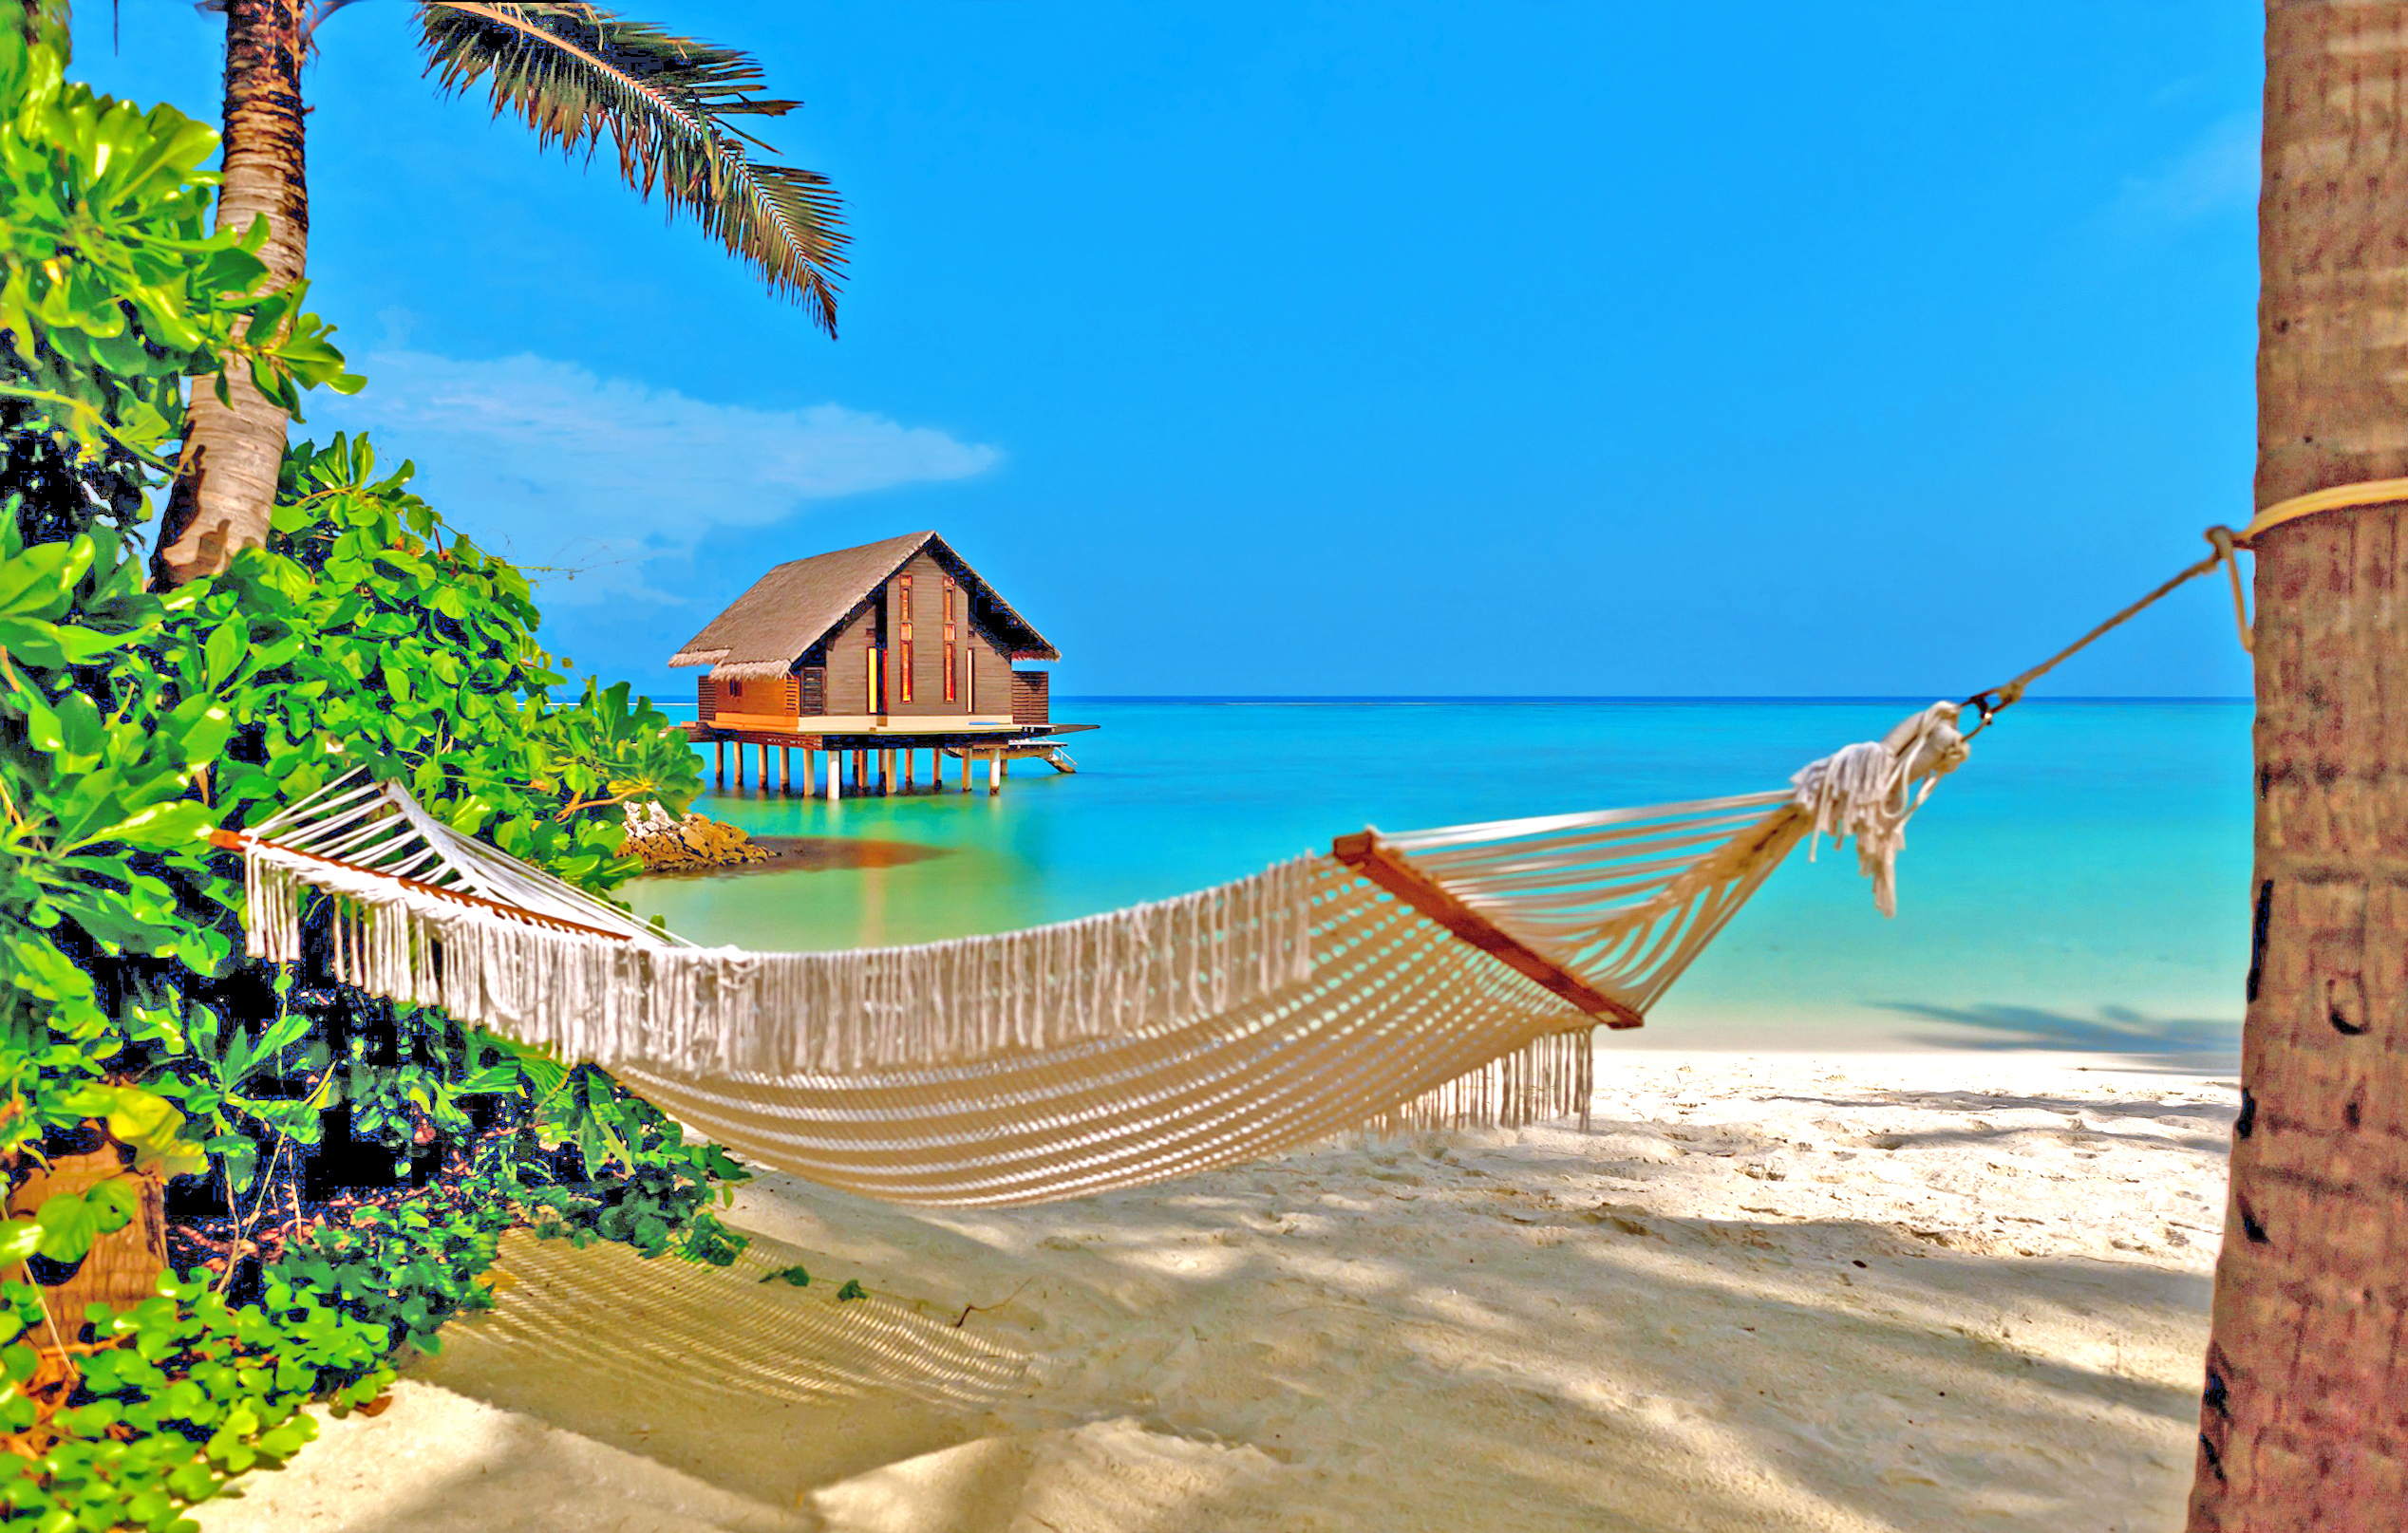 остров-арка картинки океан и гамак недолгое время брака